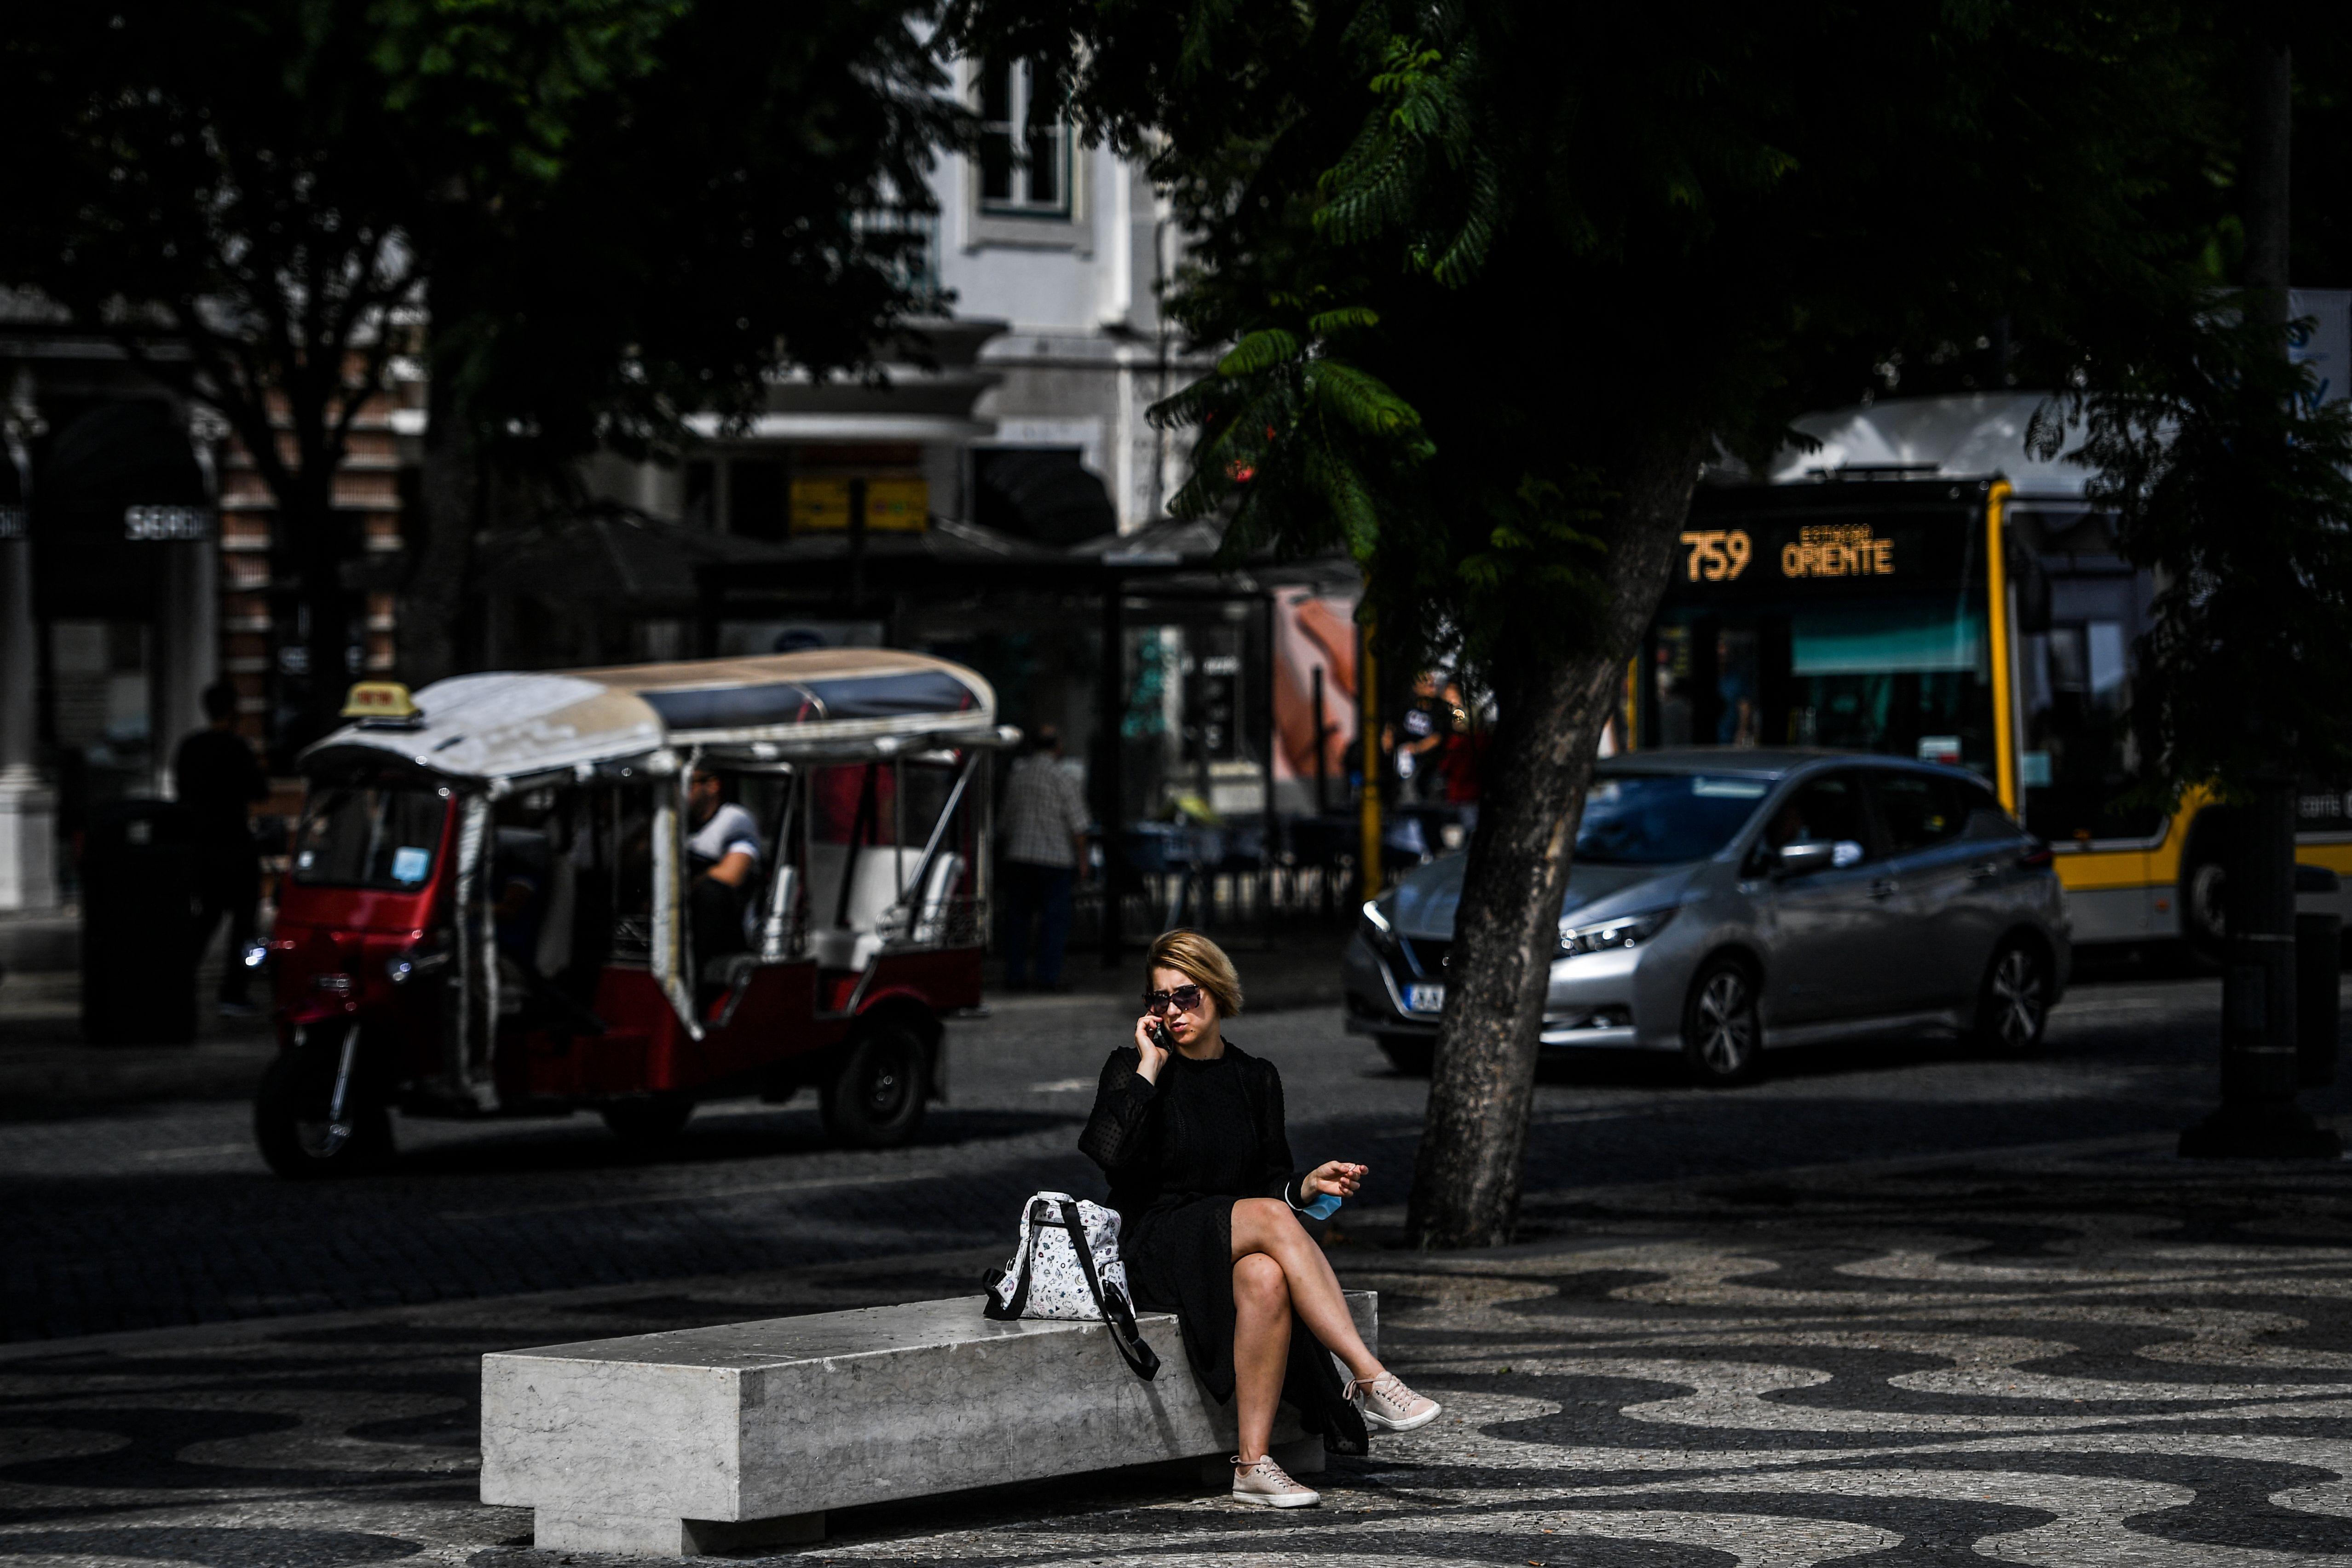 Mulher fala ao telefone em Lisboa